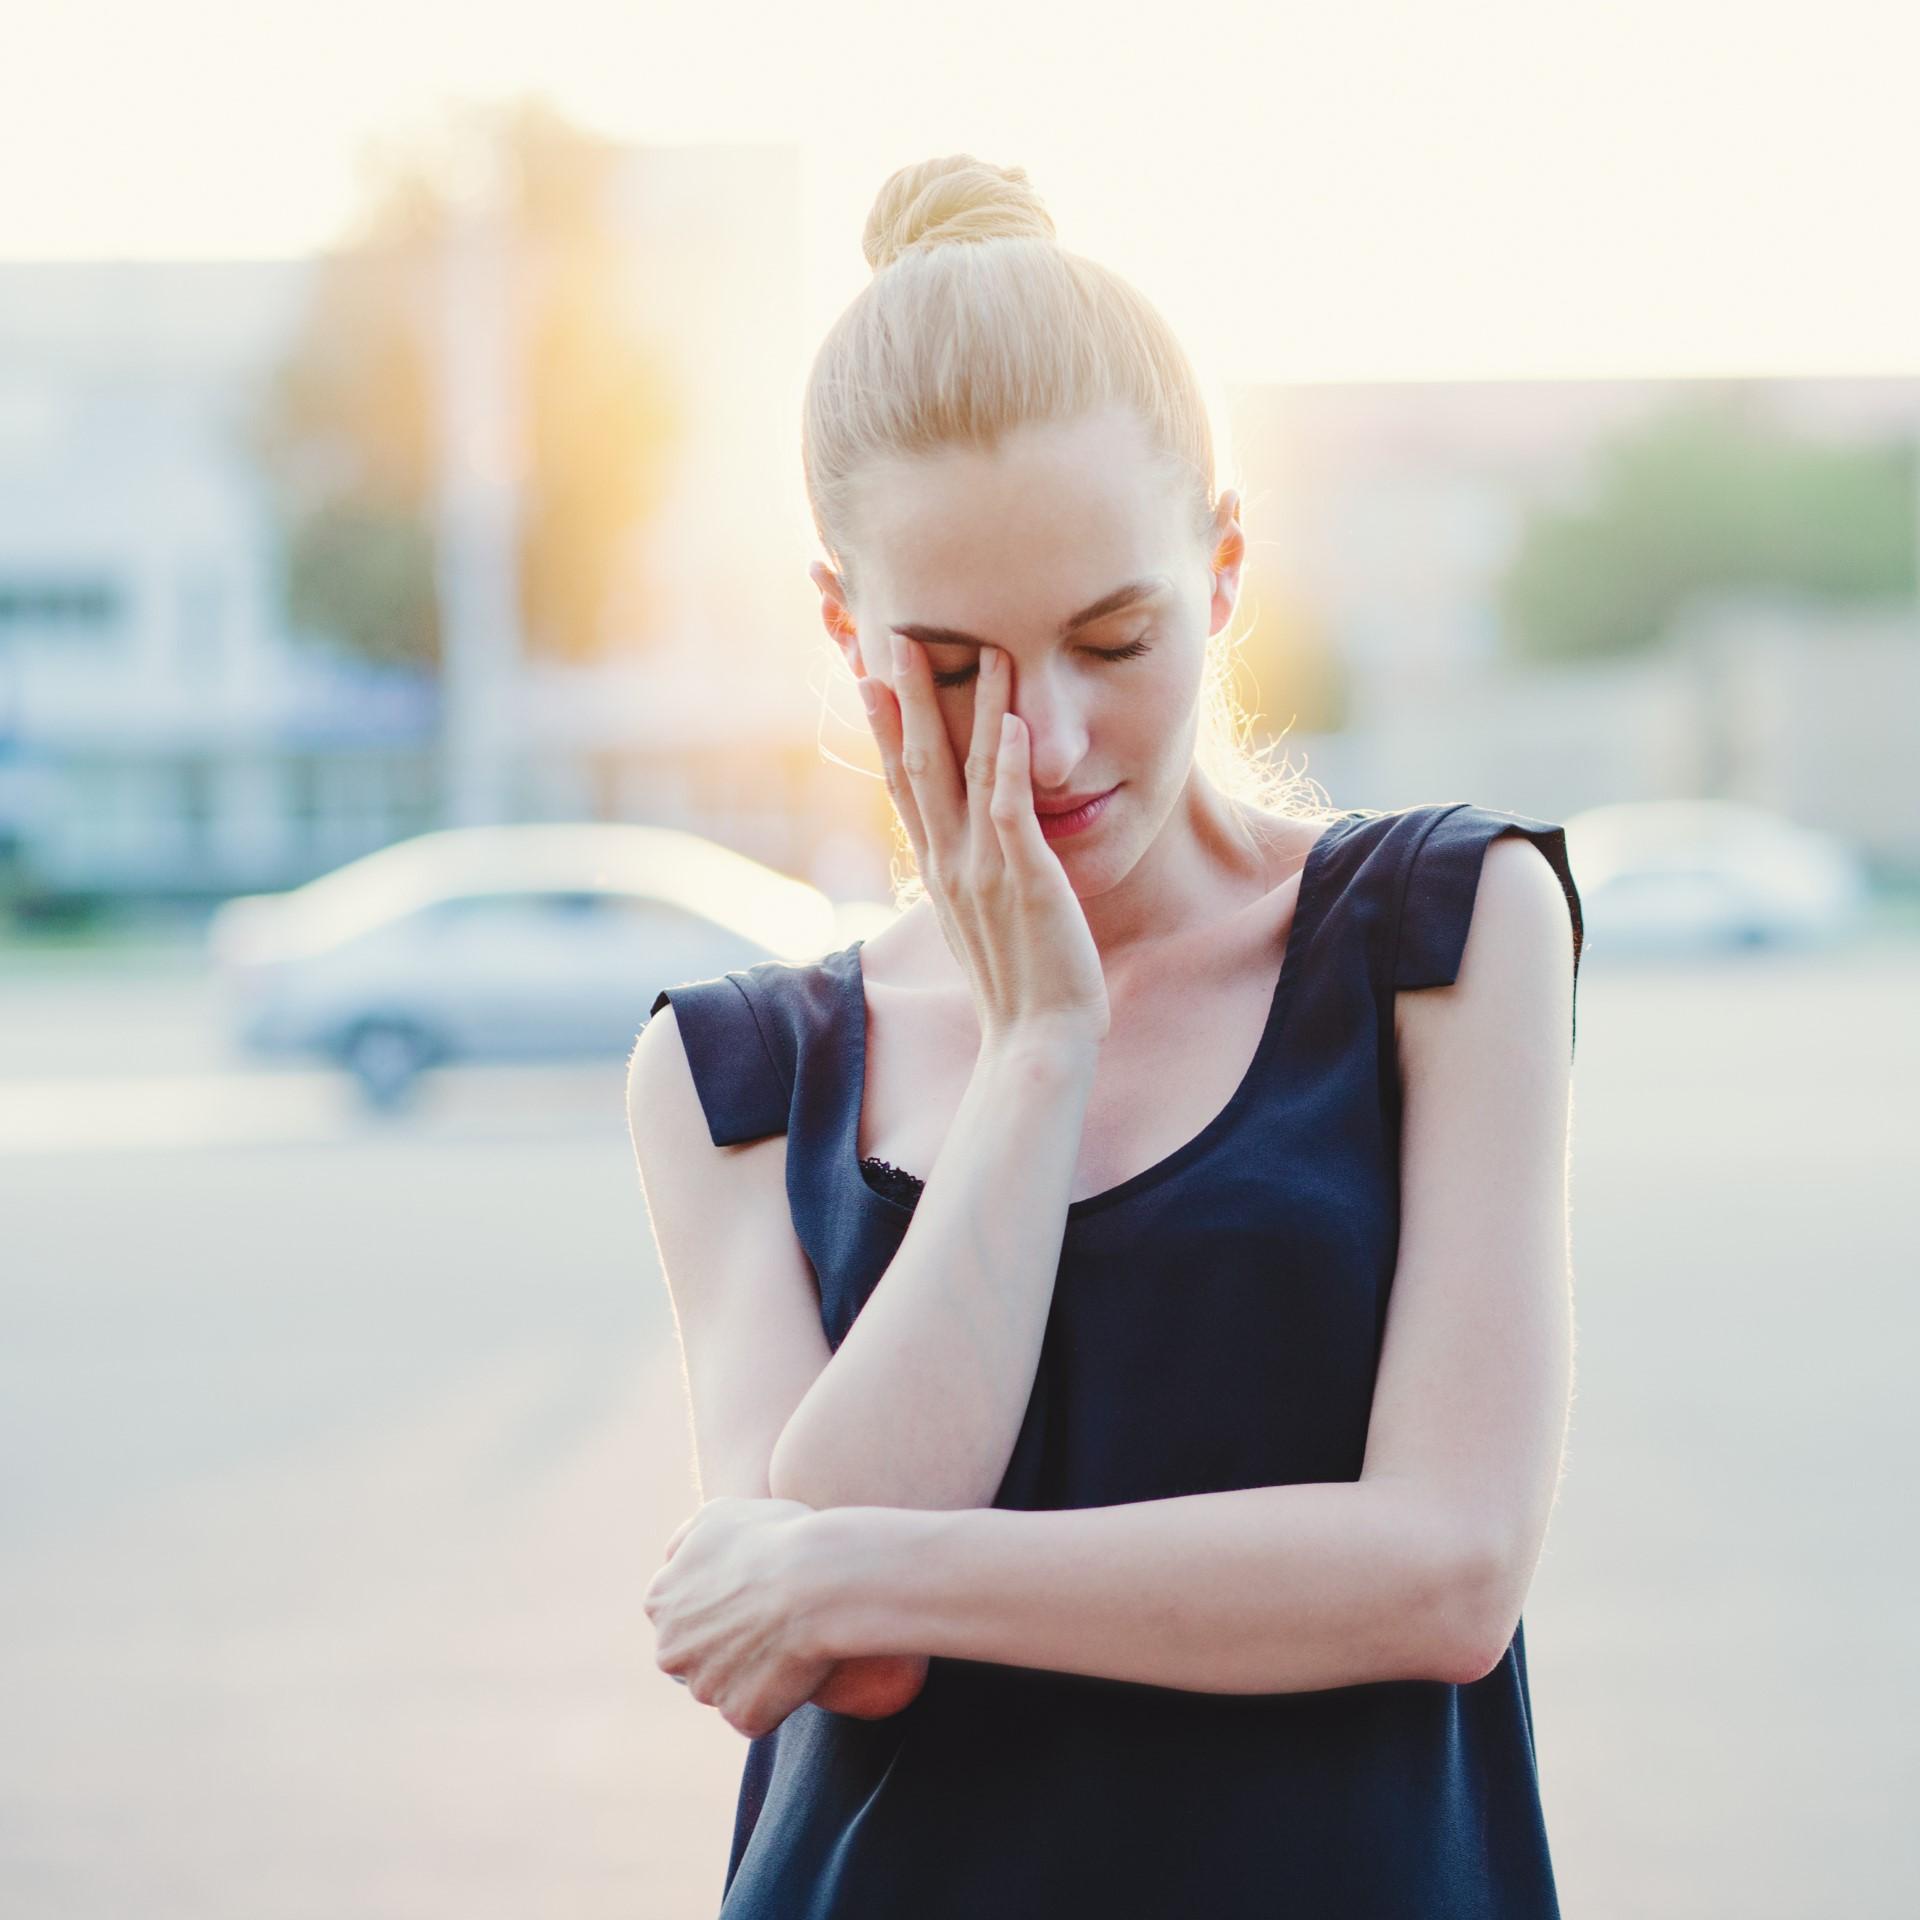 Emotive young beautiful woman posing on the street